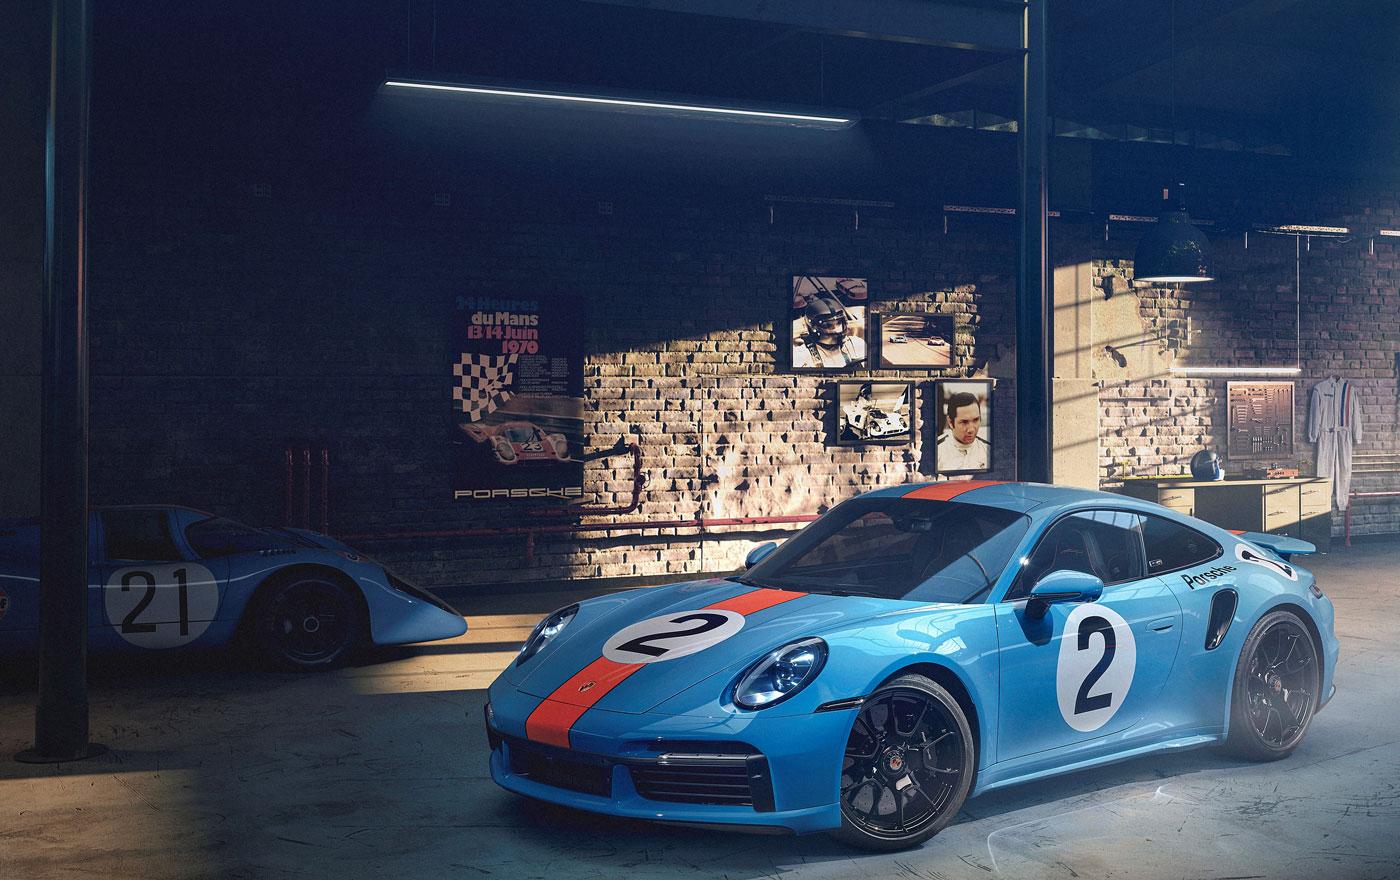 Porsche-992-Turbo-S-Pedro-Rodriguez-2